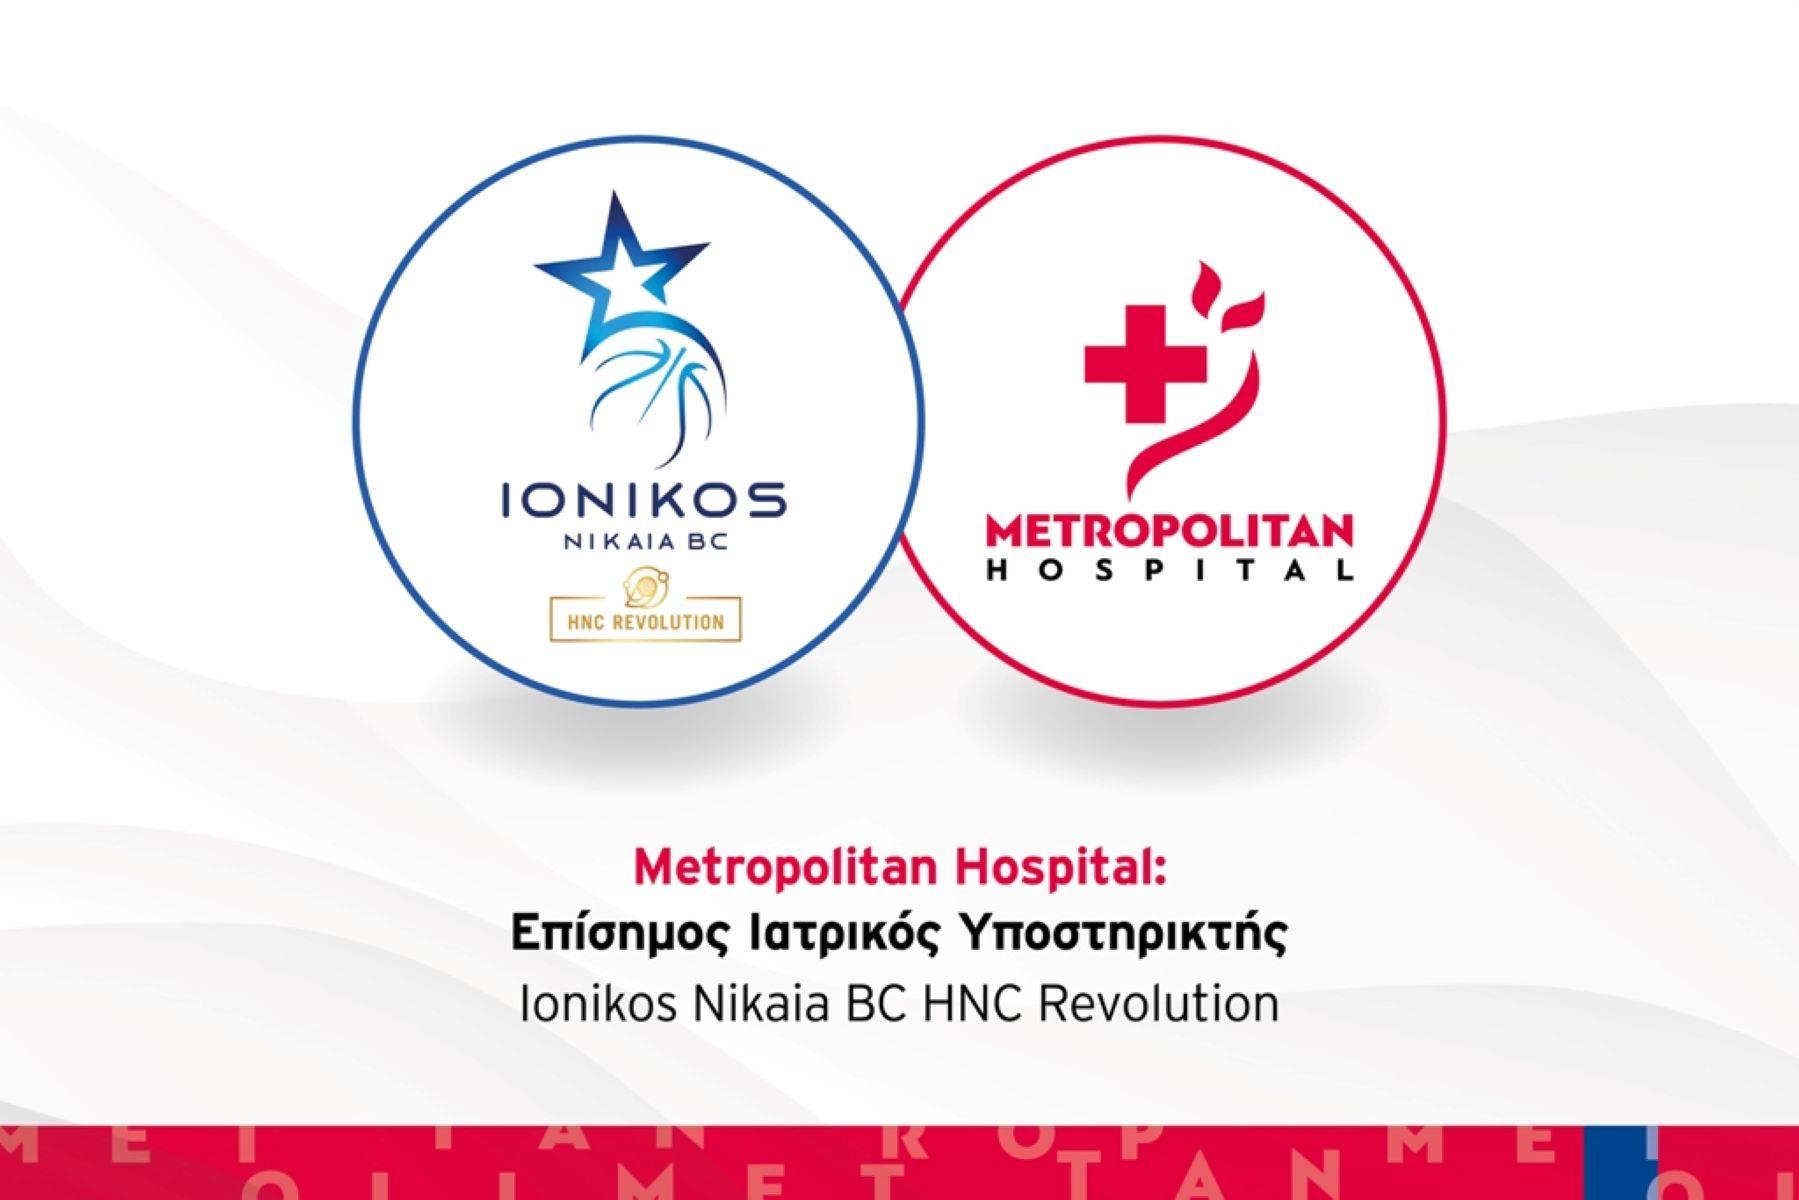 Metropolitan Hospital: Επίσημος Υποστηρικτής της  Ionikos Nikaia BC HNC Revolution